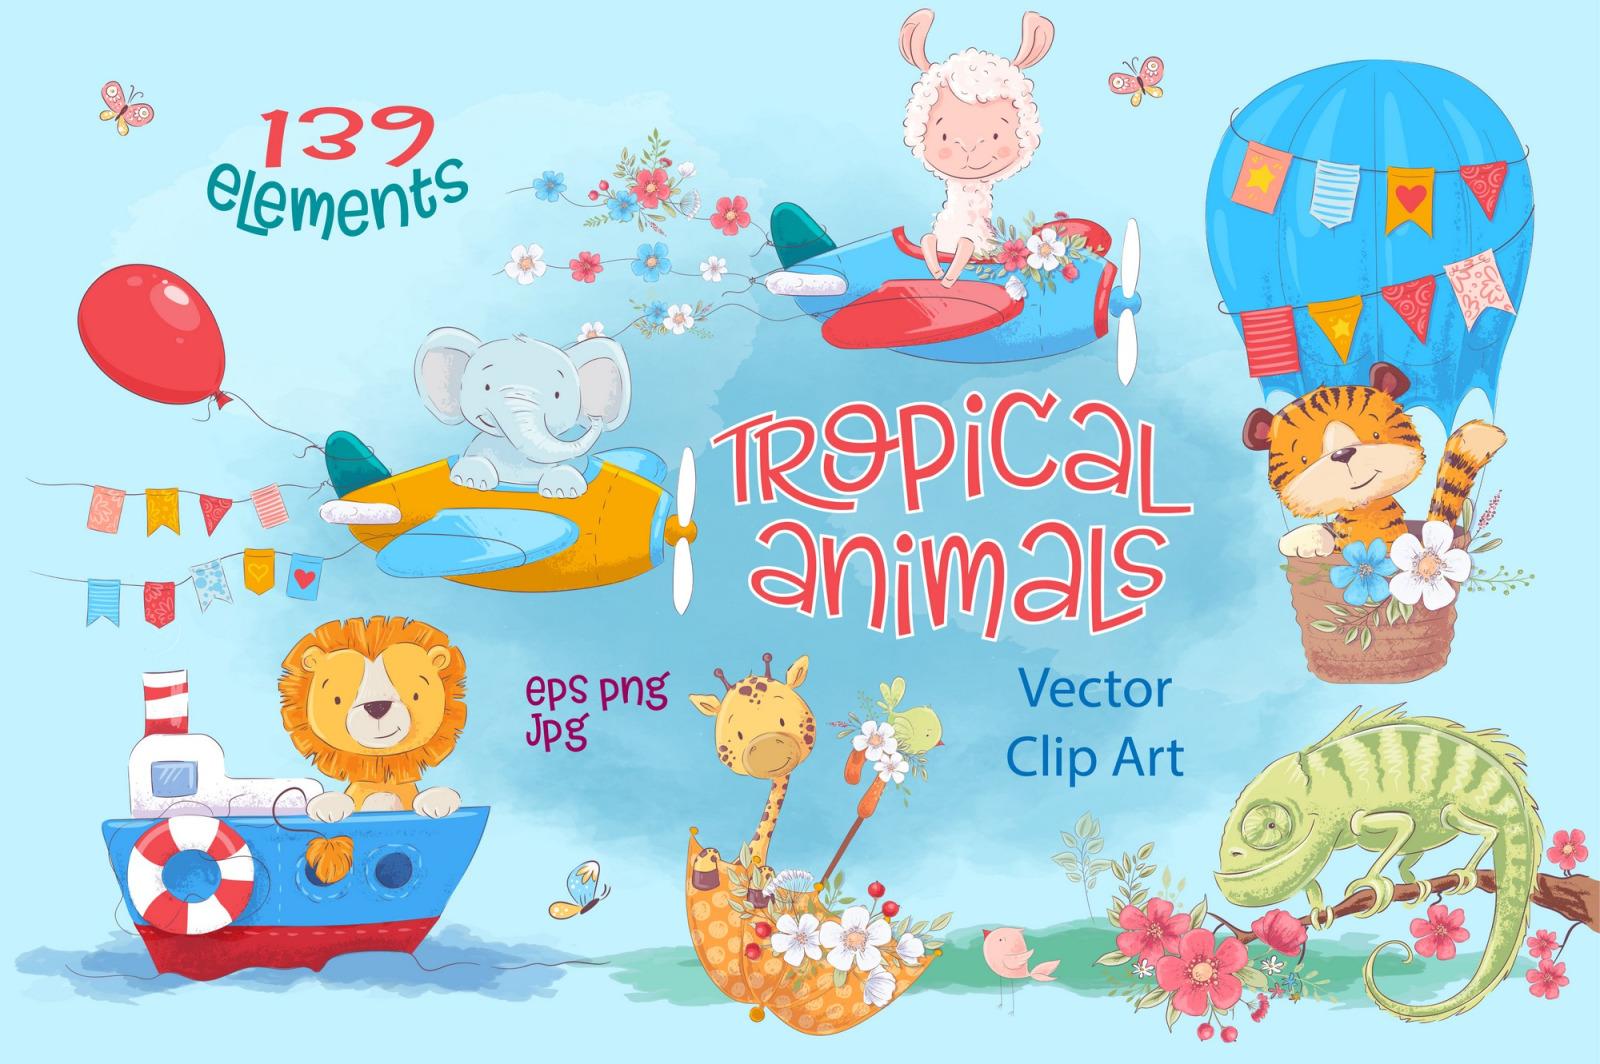 Tropical animals – vector clip art